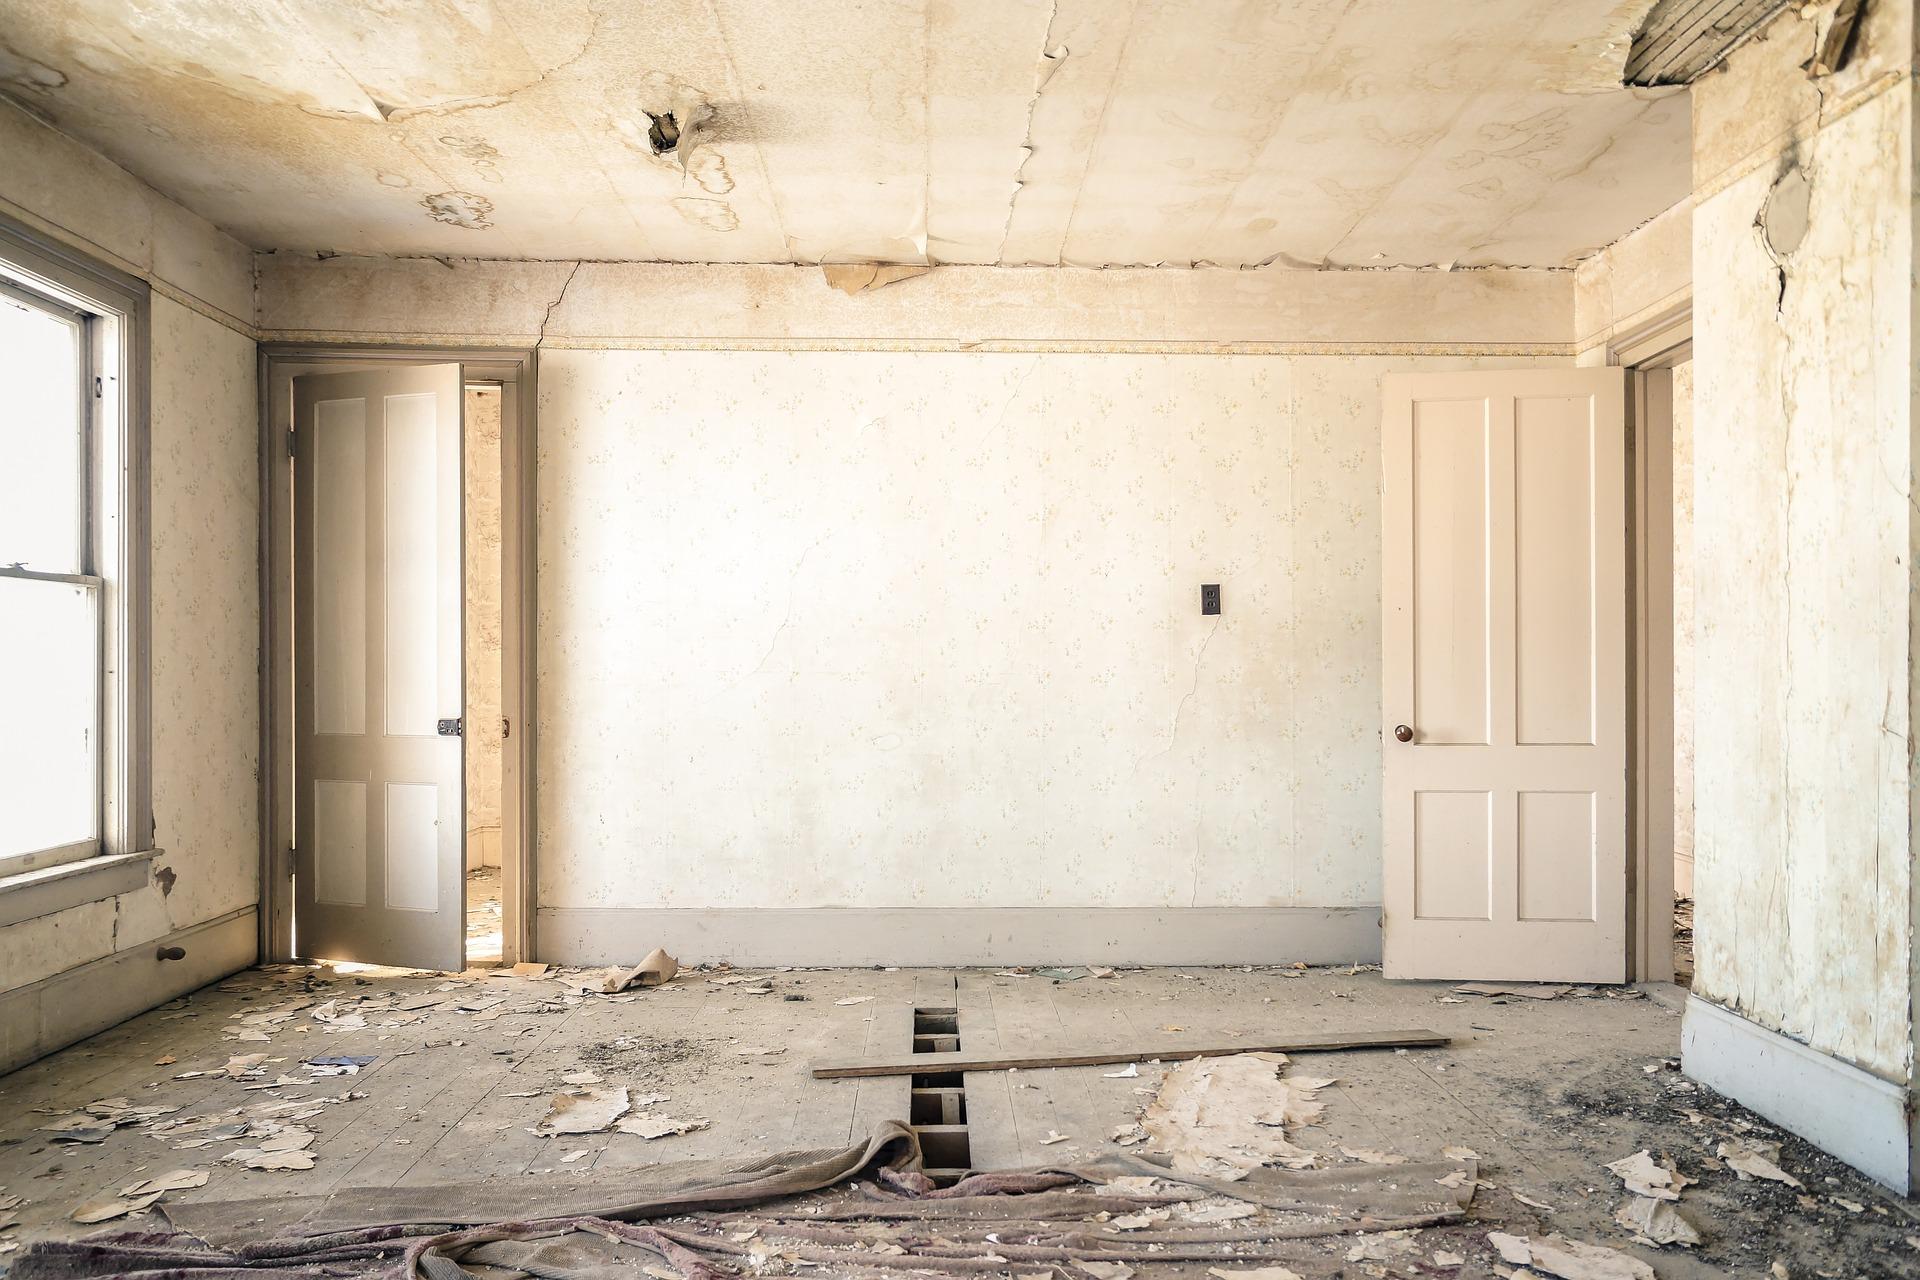 comprare una casa da ristrutturare